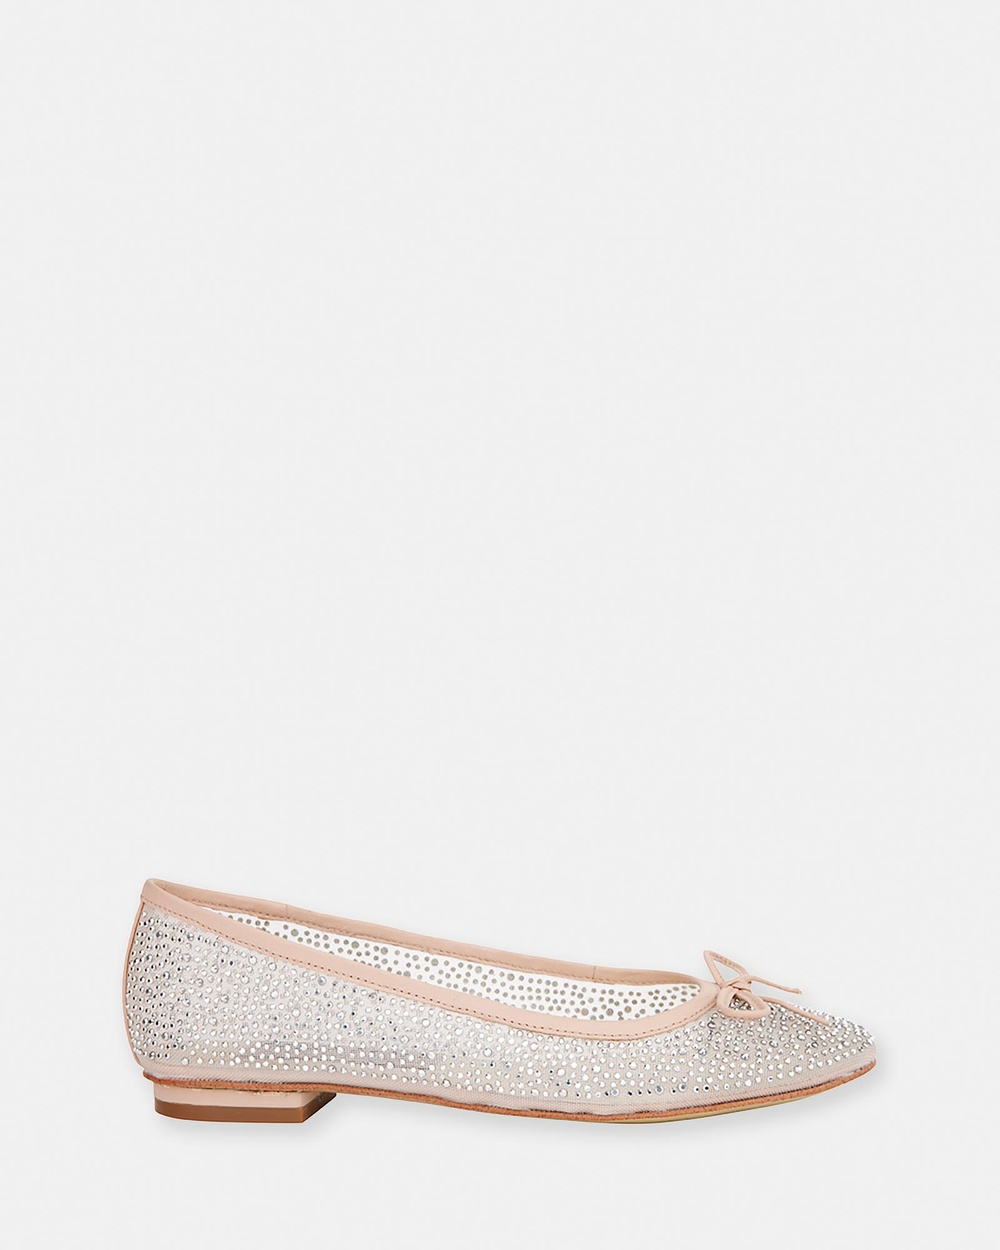 Alan Pinkus Twinkle Ballet Flats BLUSH